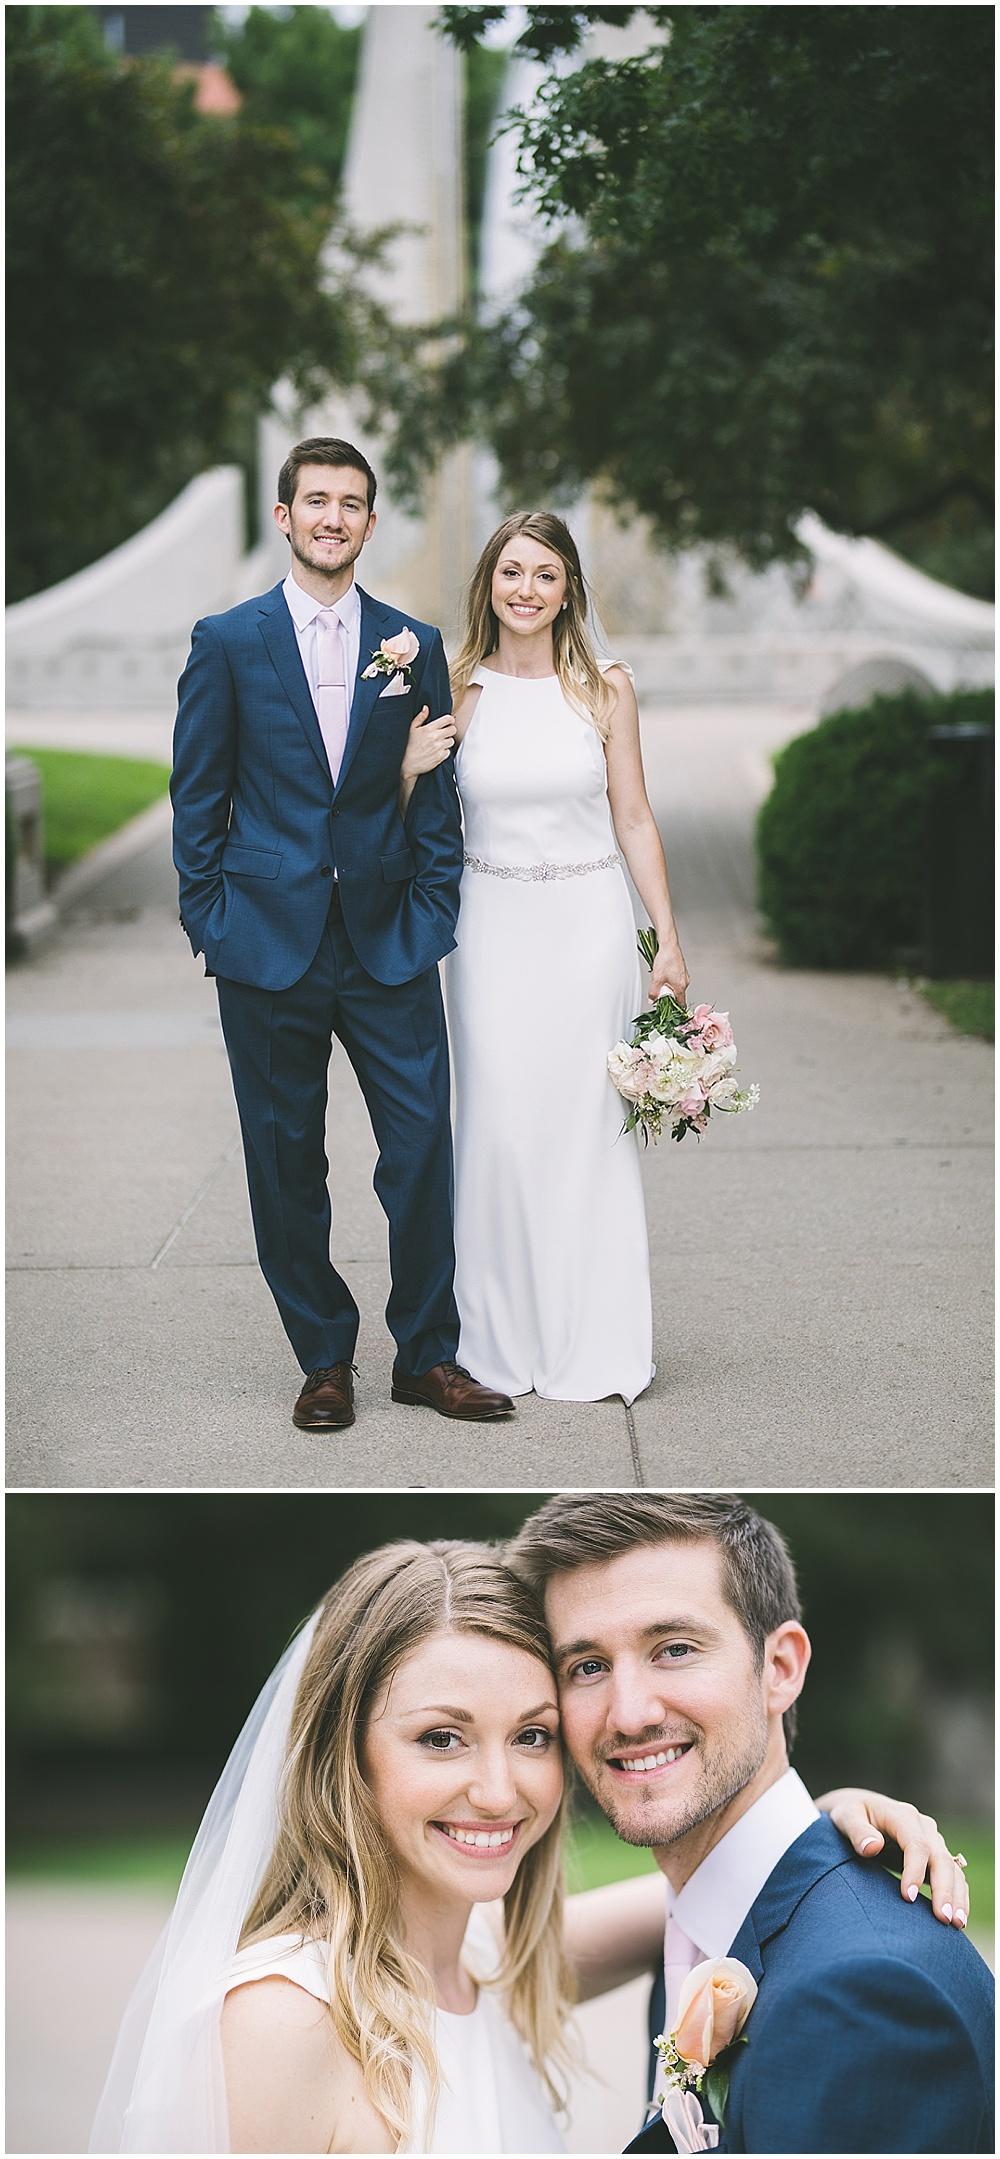 A garden-inspired Purdue University wedding | Purdue alumni wedding, shively club wedding, boilermaker wedding, blush wedding, bride and groom